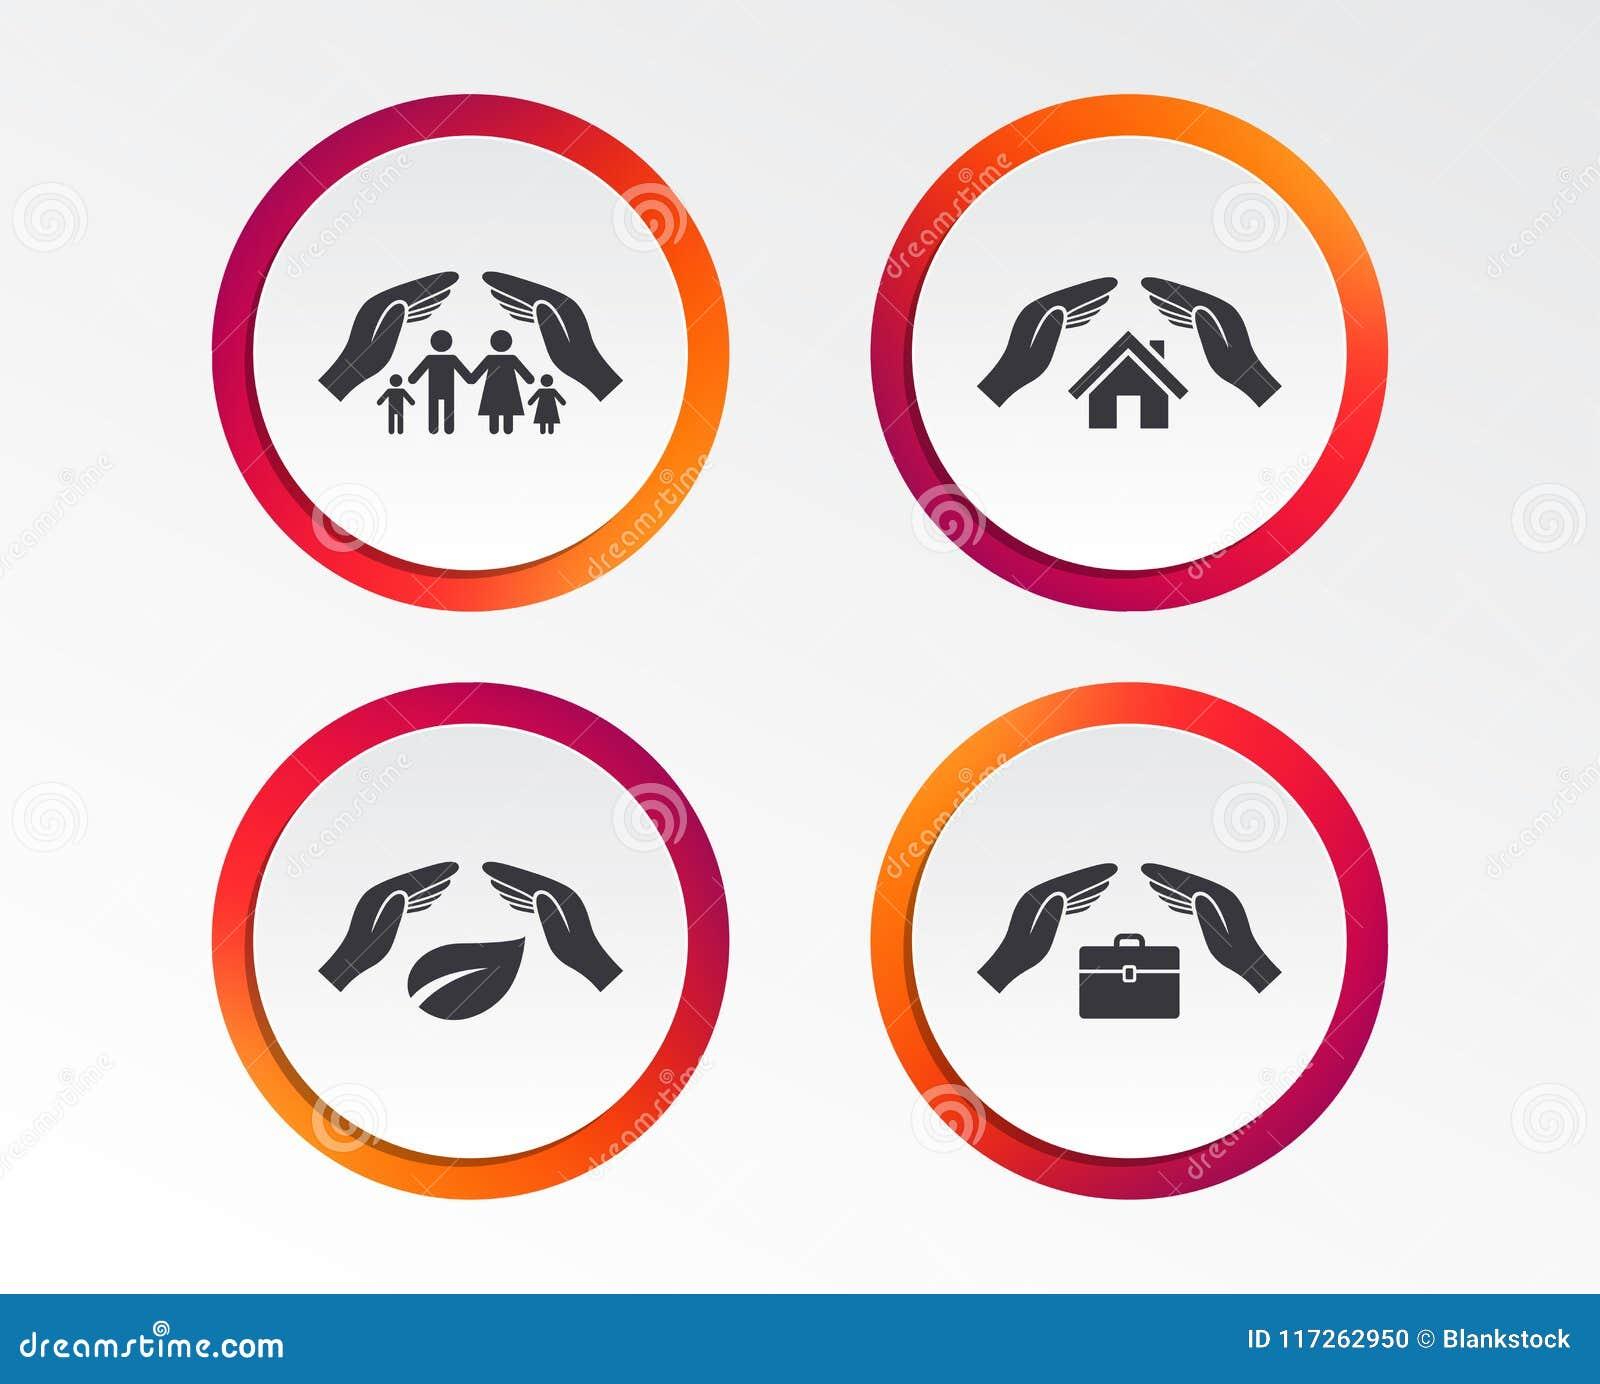 Hands Insurance Icons Human Life Assurance Stock Vector